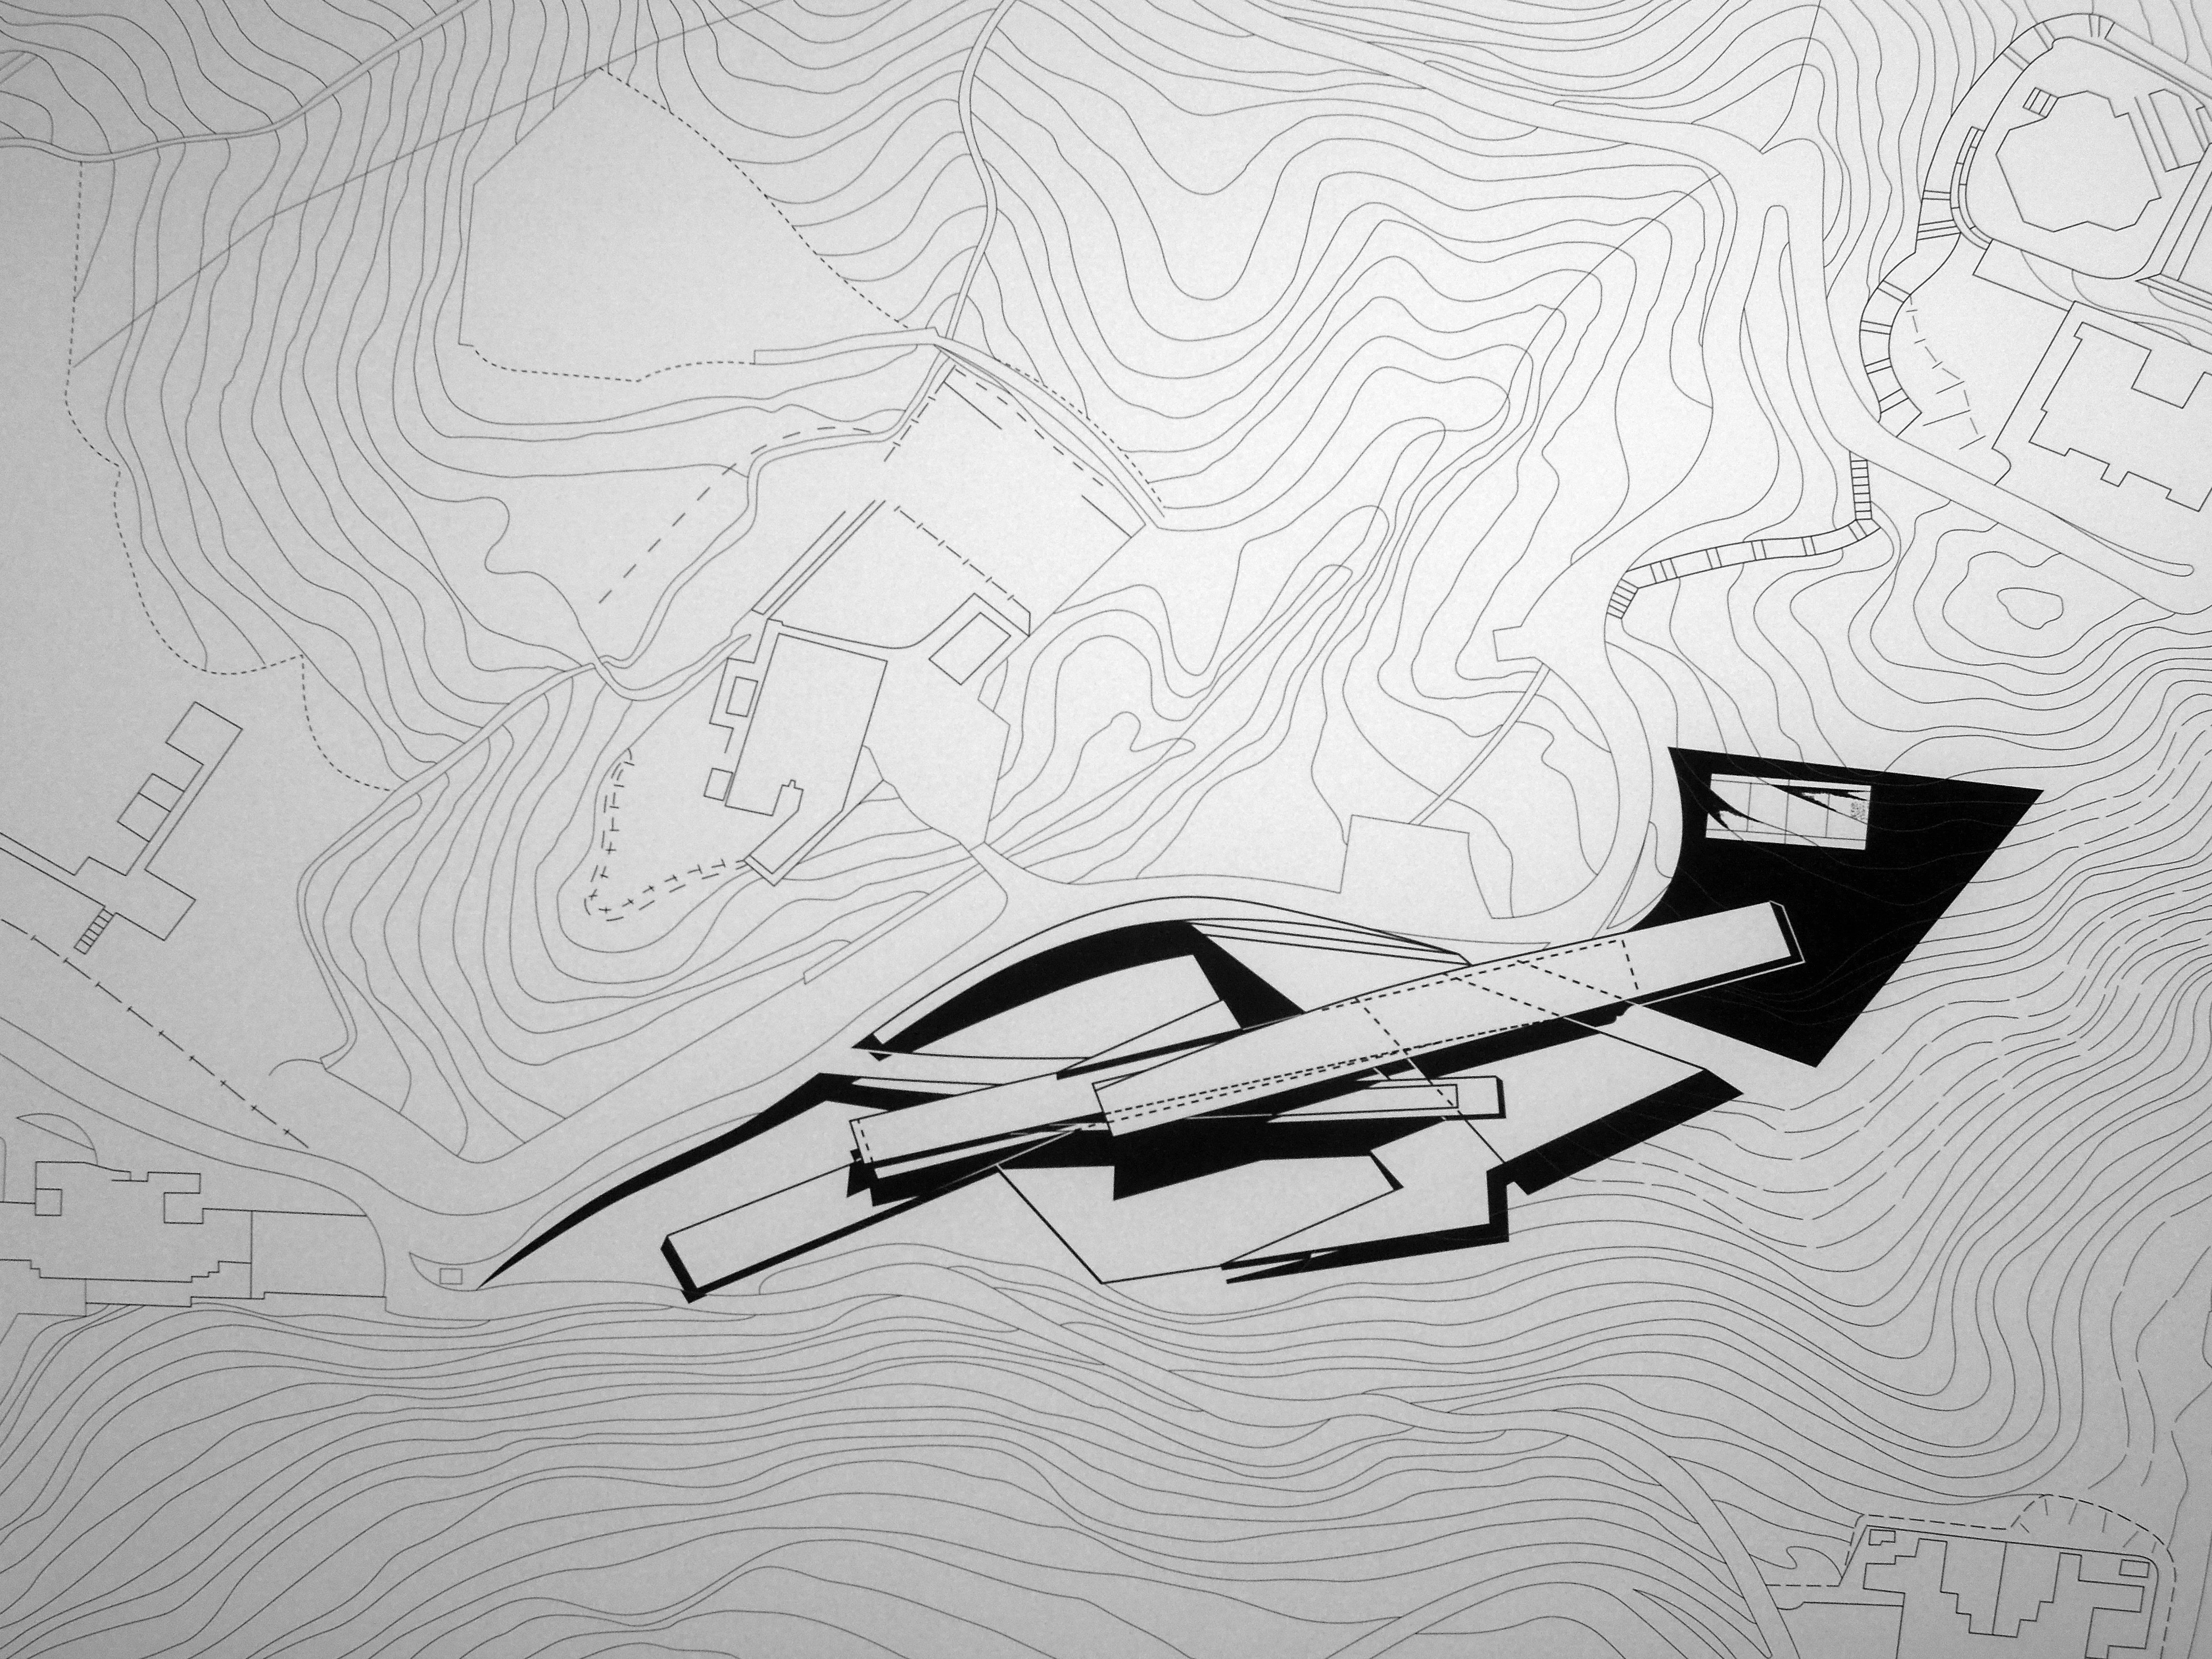 Hong kong peak drawing zaha google search point line plane hong kong peak drawing zaha google search publicscrutiny Images